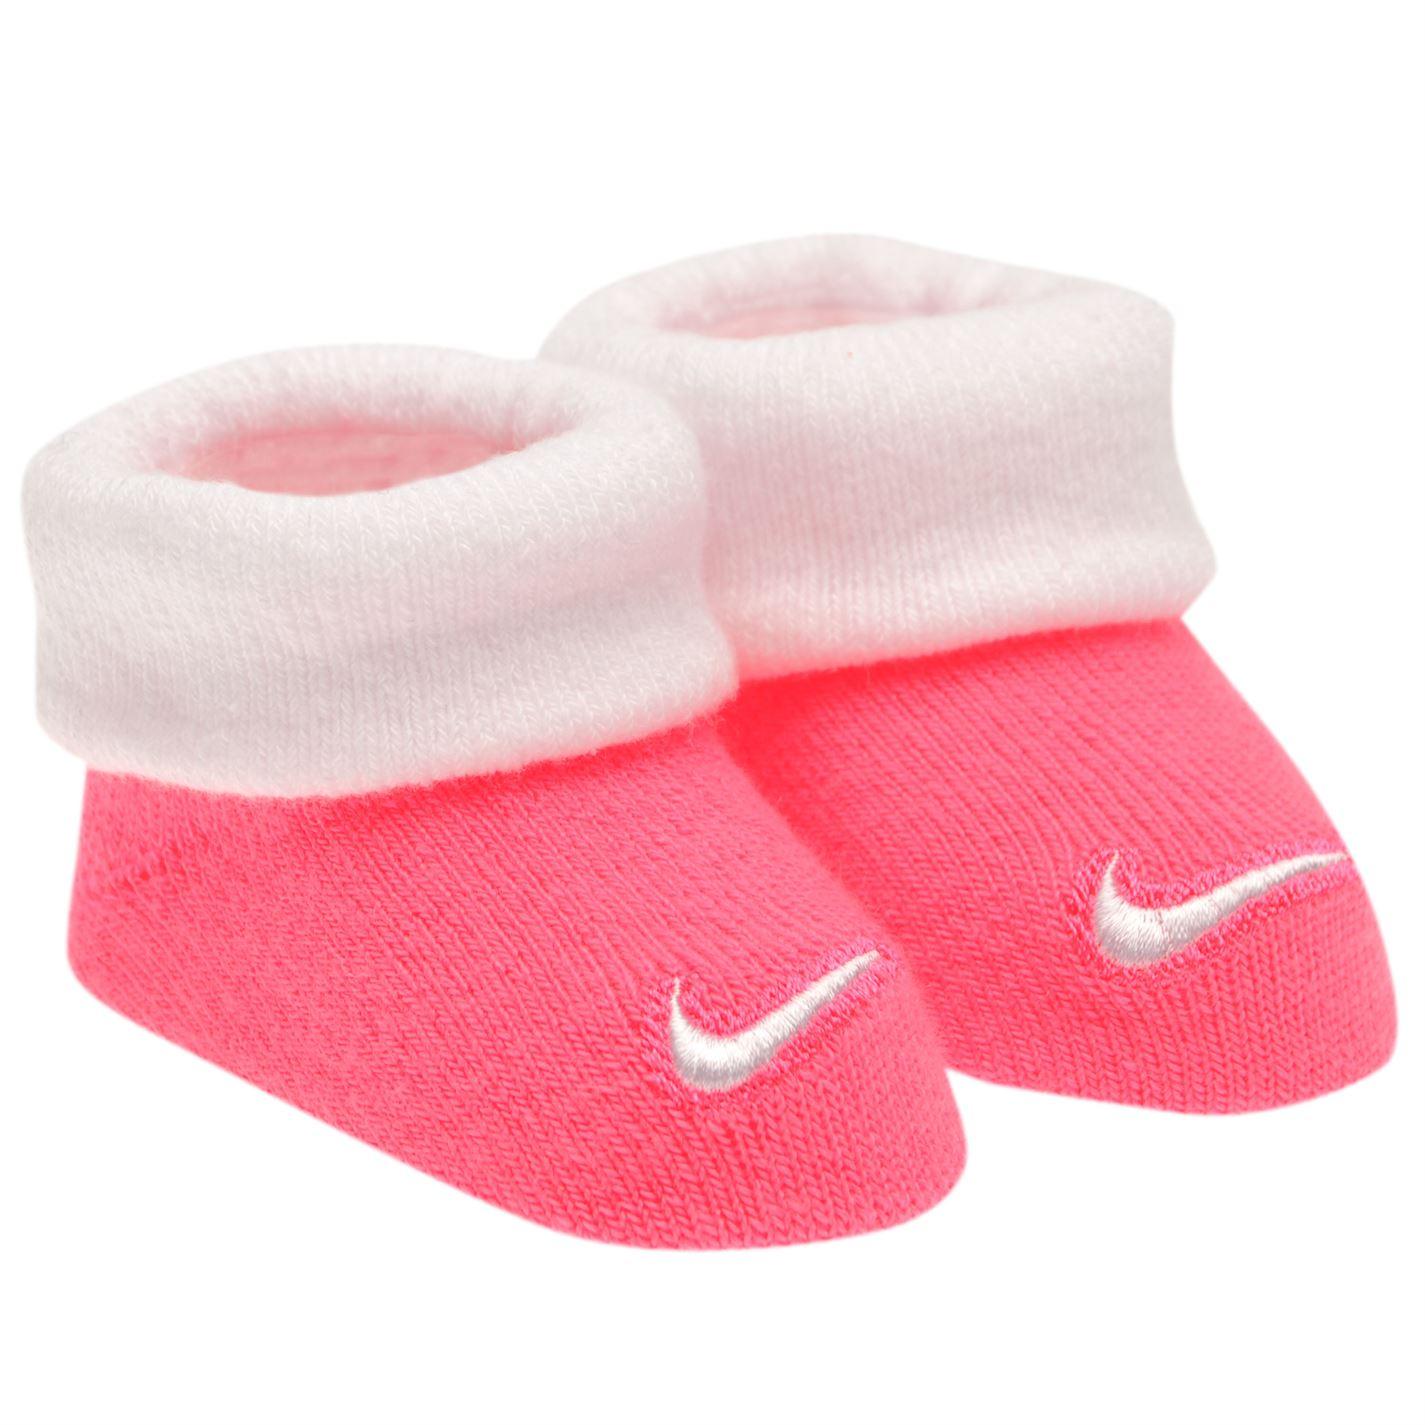 uk availability 61974 ca798 Babyschuhe Nike Mädchen